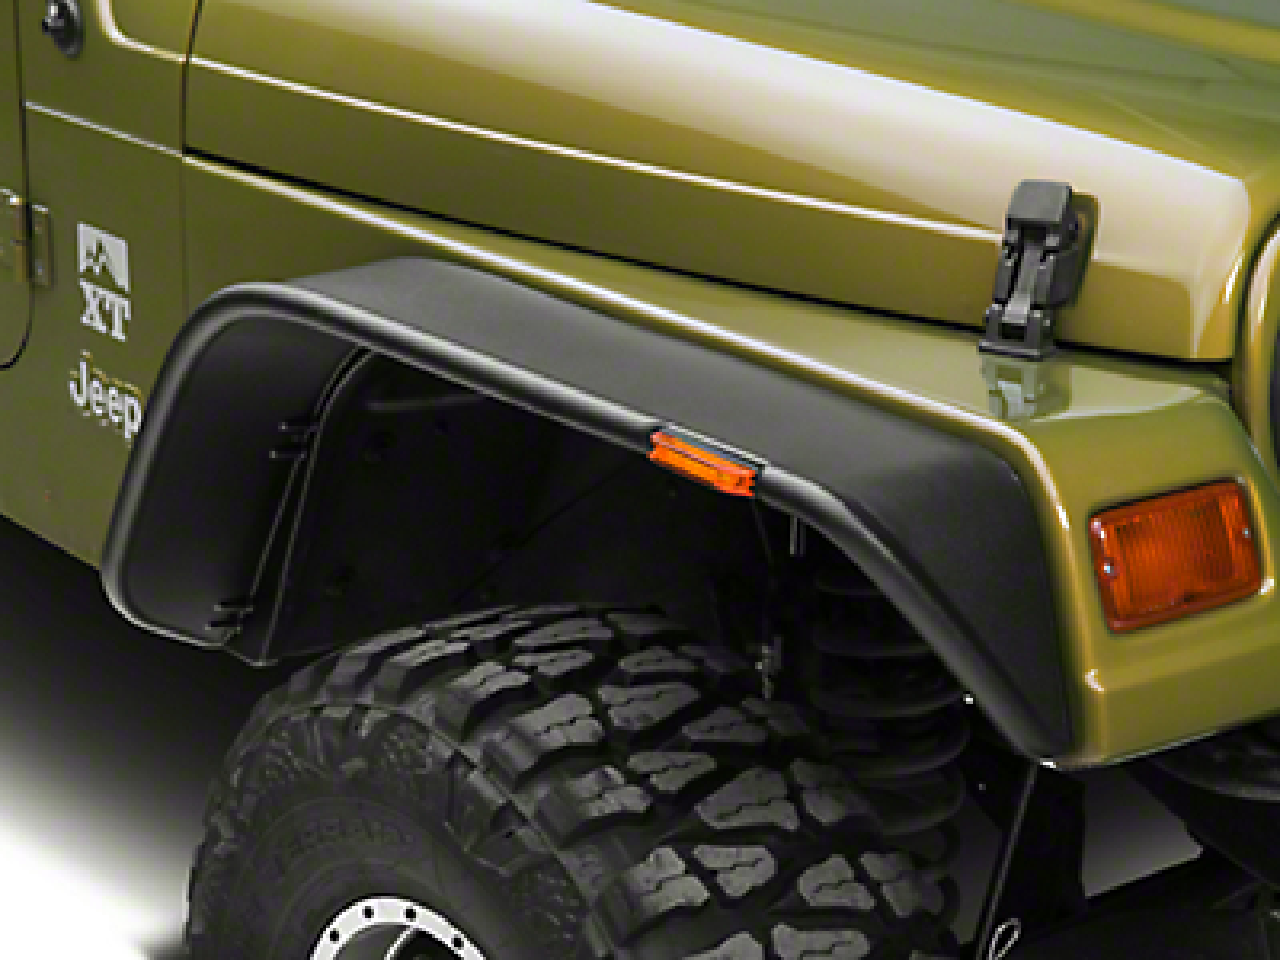 Bushwacker Flat Style Fender Flares (97-06 Jeep Wrangler TJ)